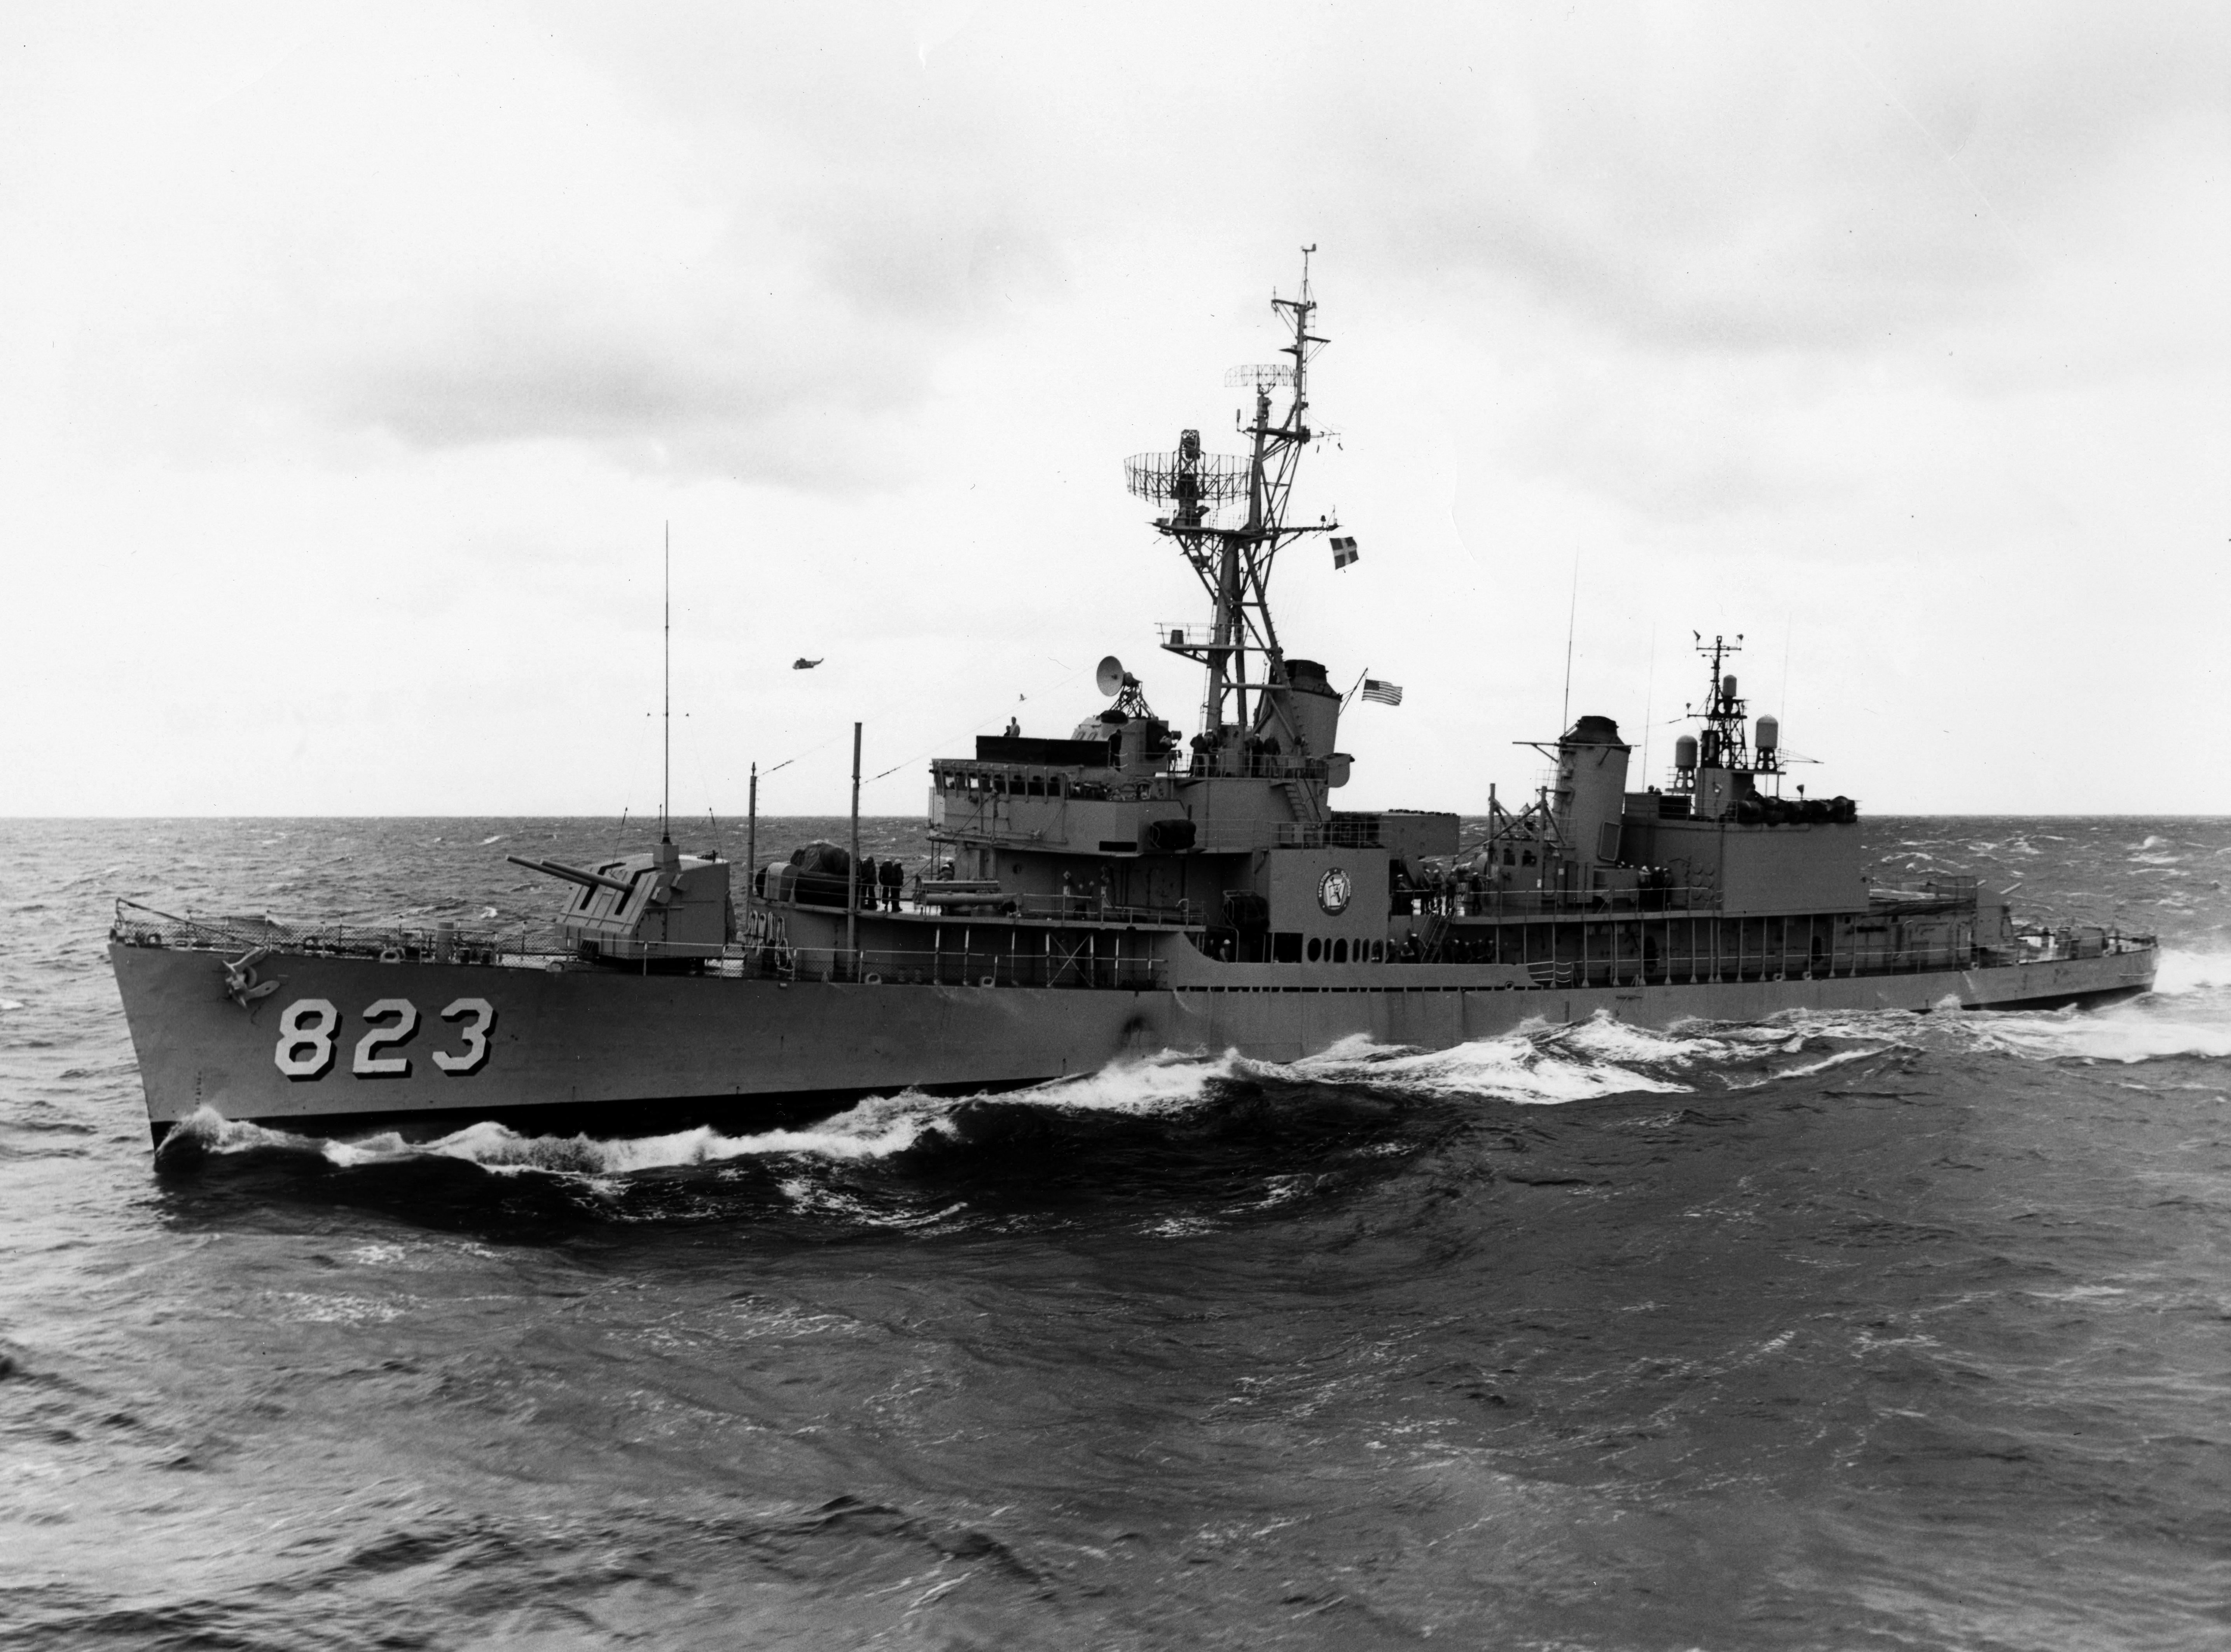 File:USS Samuel B. Roberts (DD-823) underway in October 1962